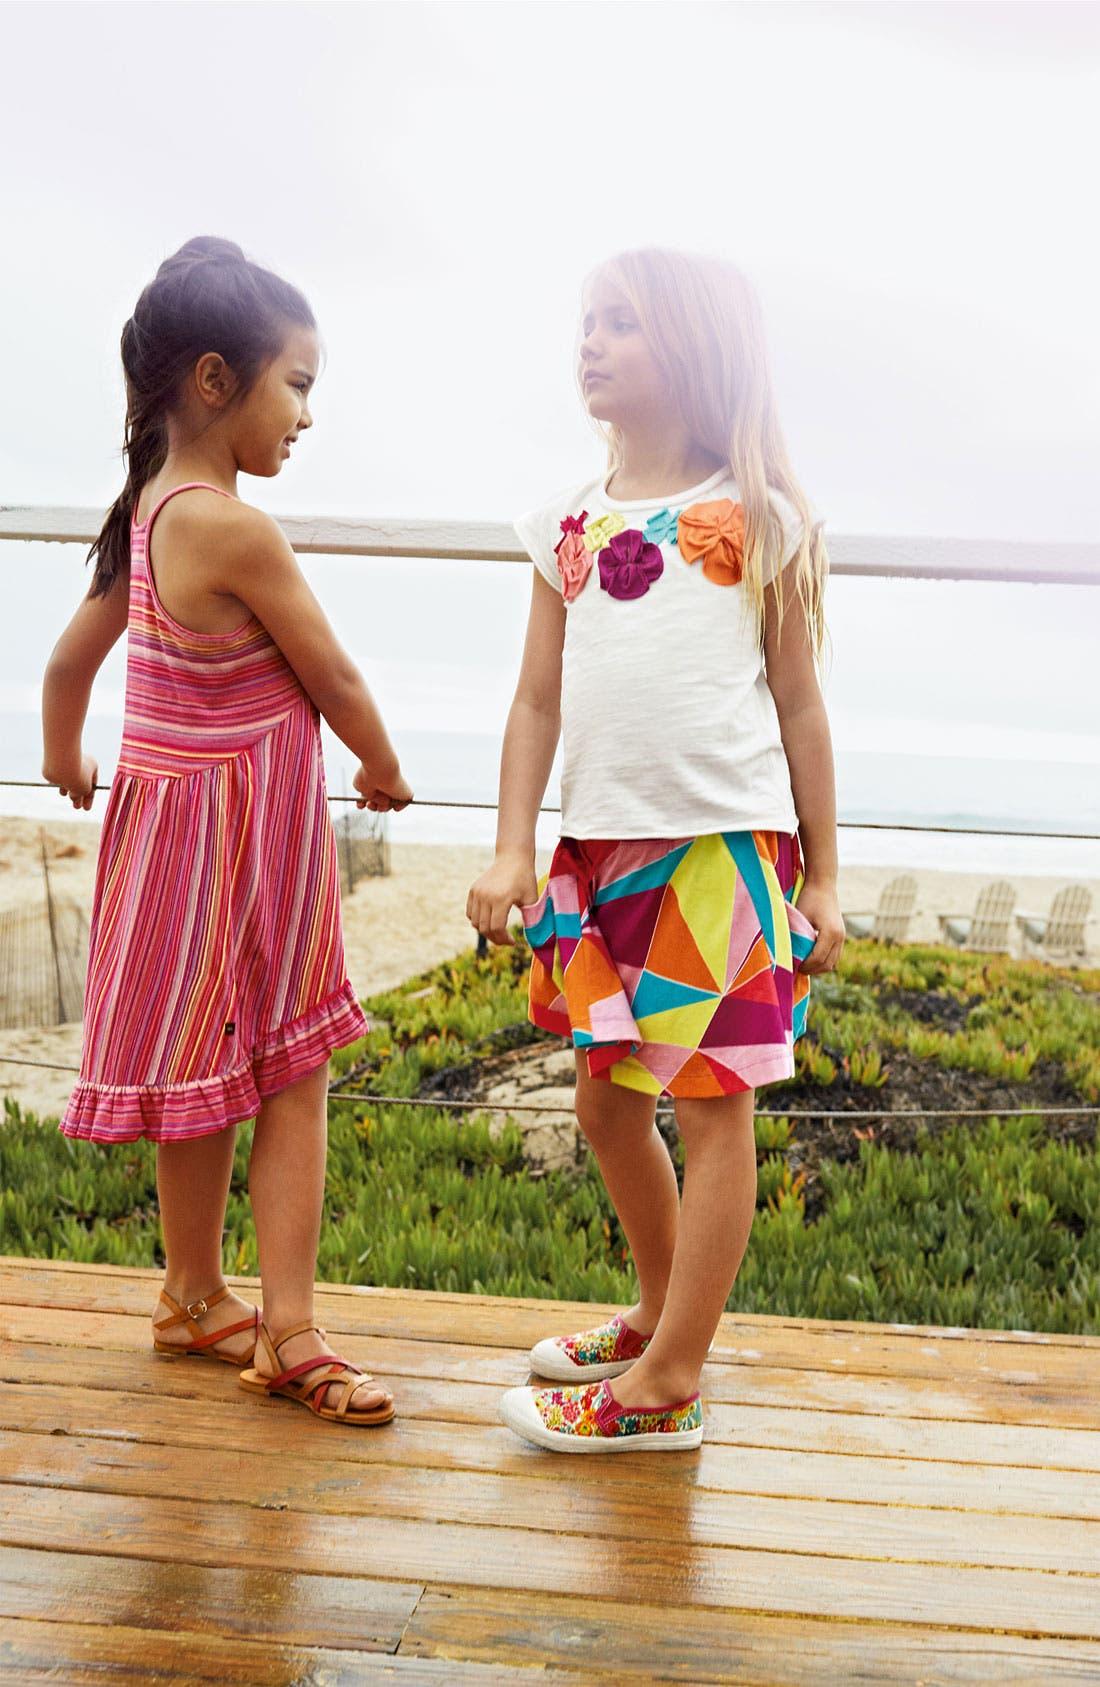 Alternate Image 1 Selected - Tea Collection Dress & Peek Sandal (Little Girls & Big Girls)